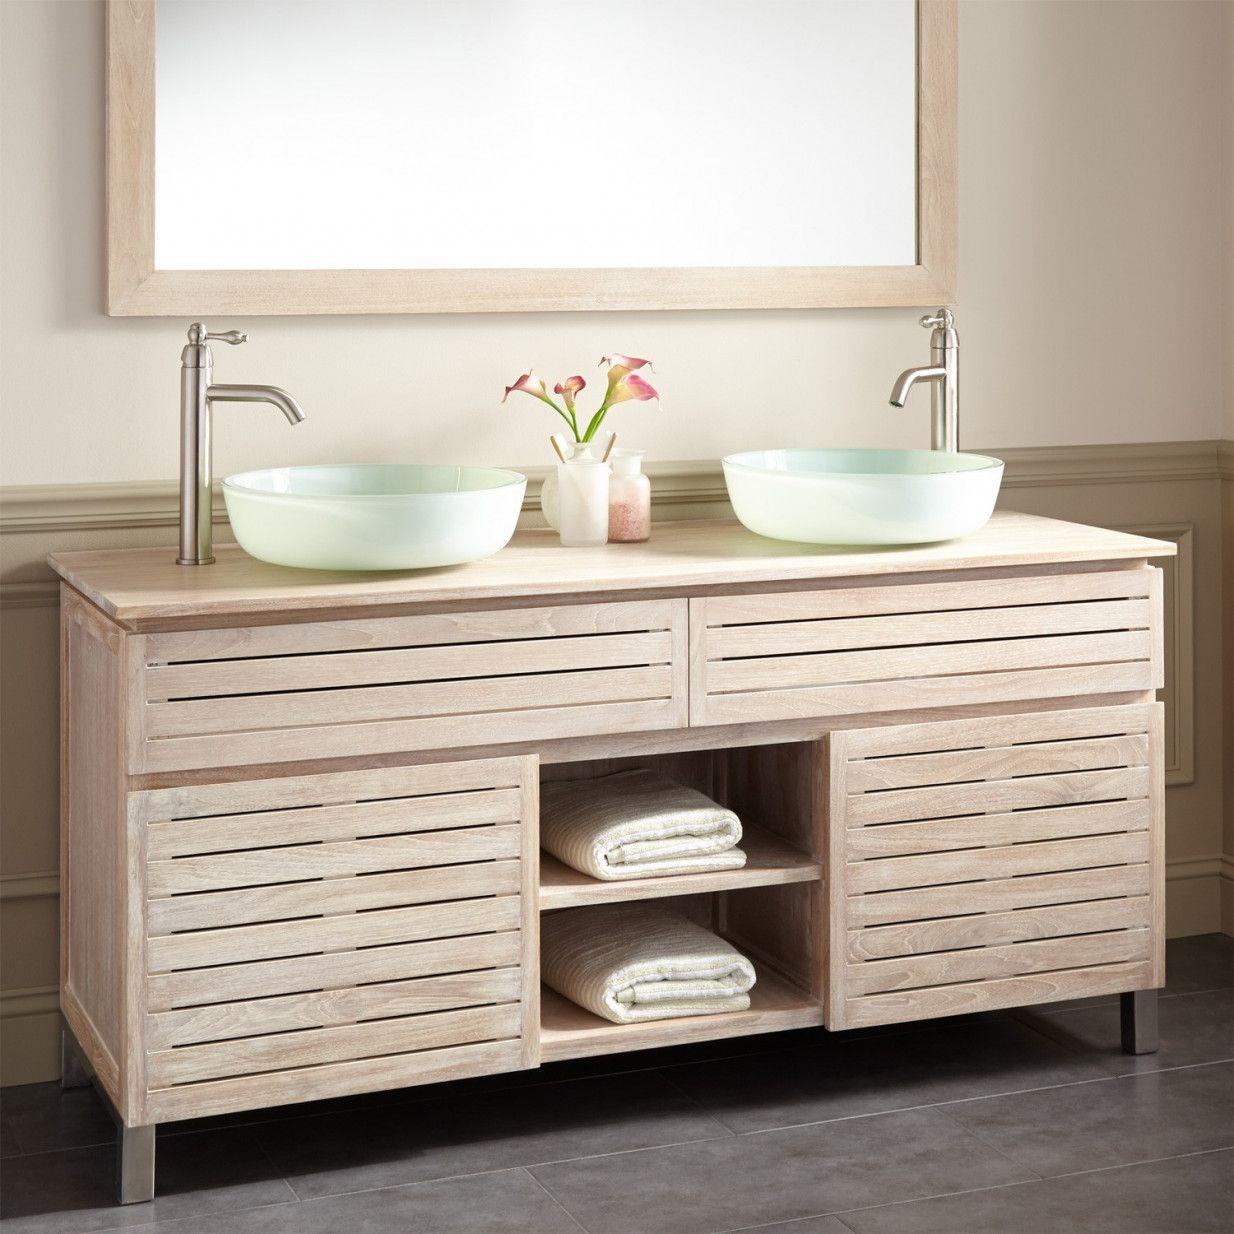 99+ Bathroom Vanities & Cabinets - Interior House Paint Ideas Check ...